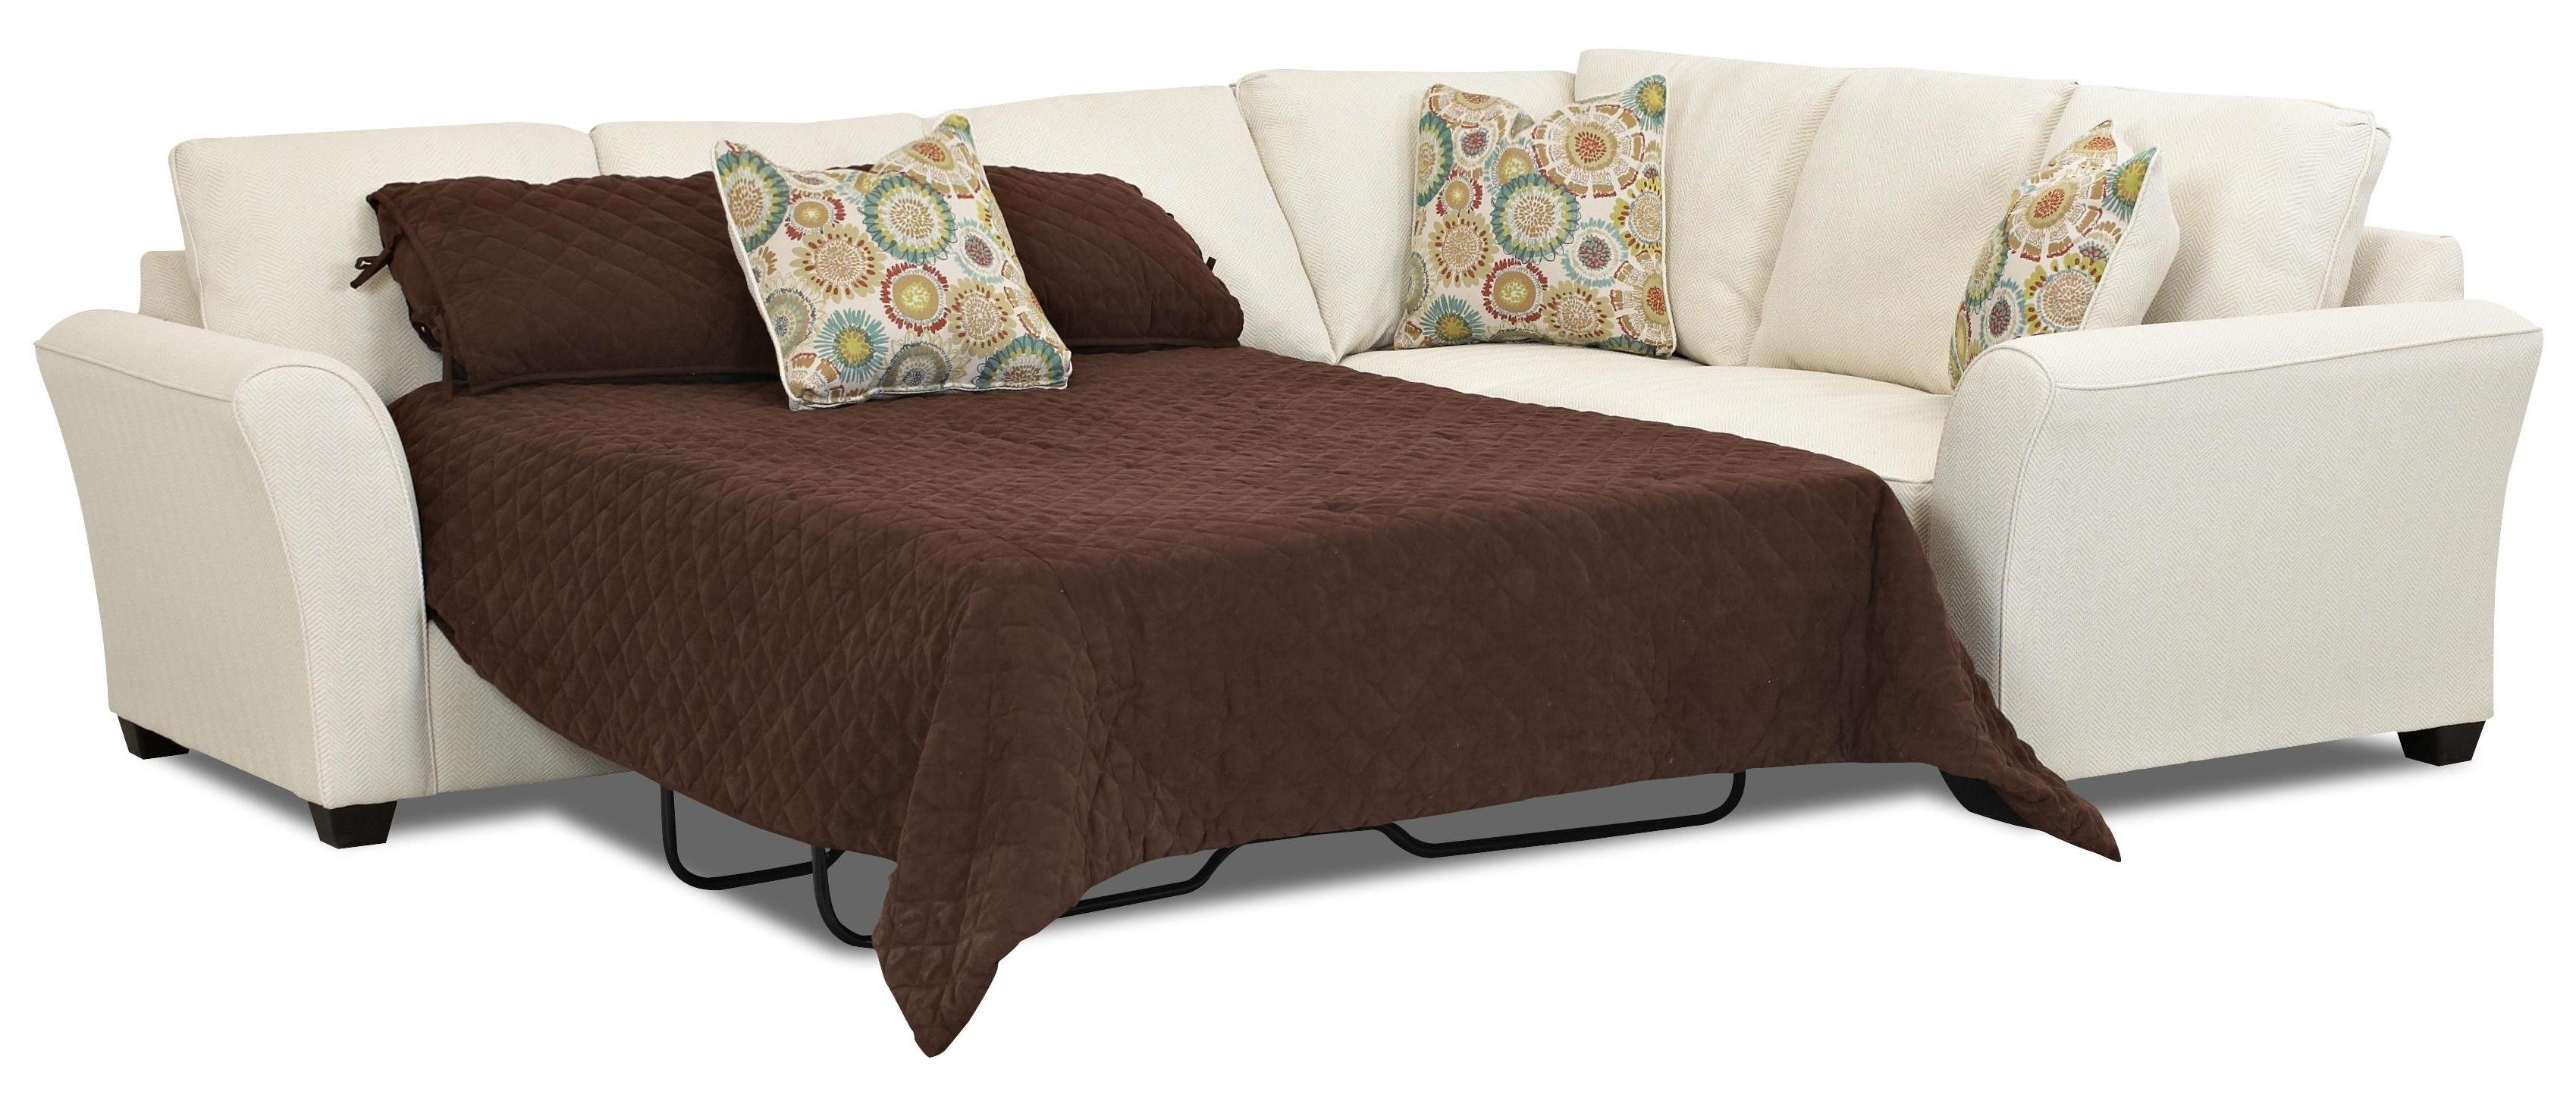 2018 New Queen Sleeper Sectional Sofa – Buildsimplehome With Regard To Sleeper Sectional Sofas (View 13 of 15)